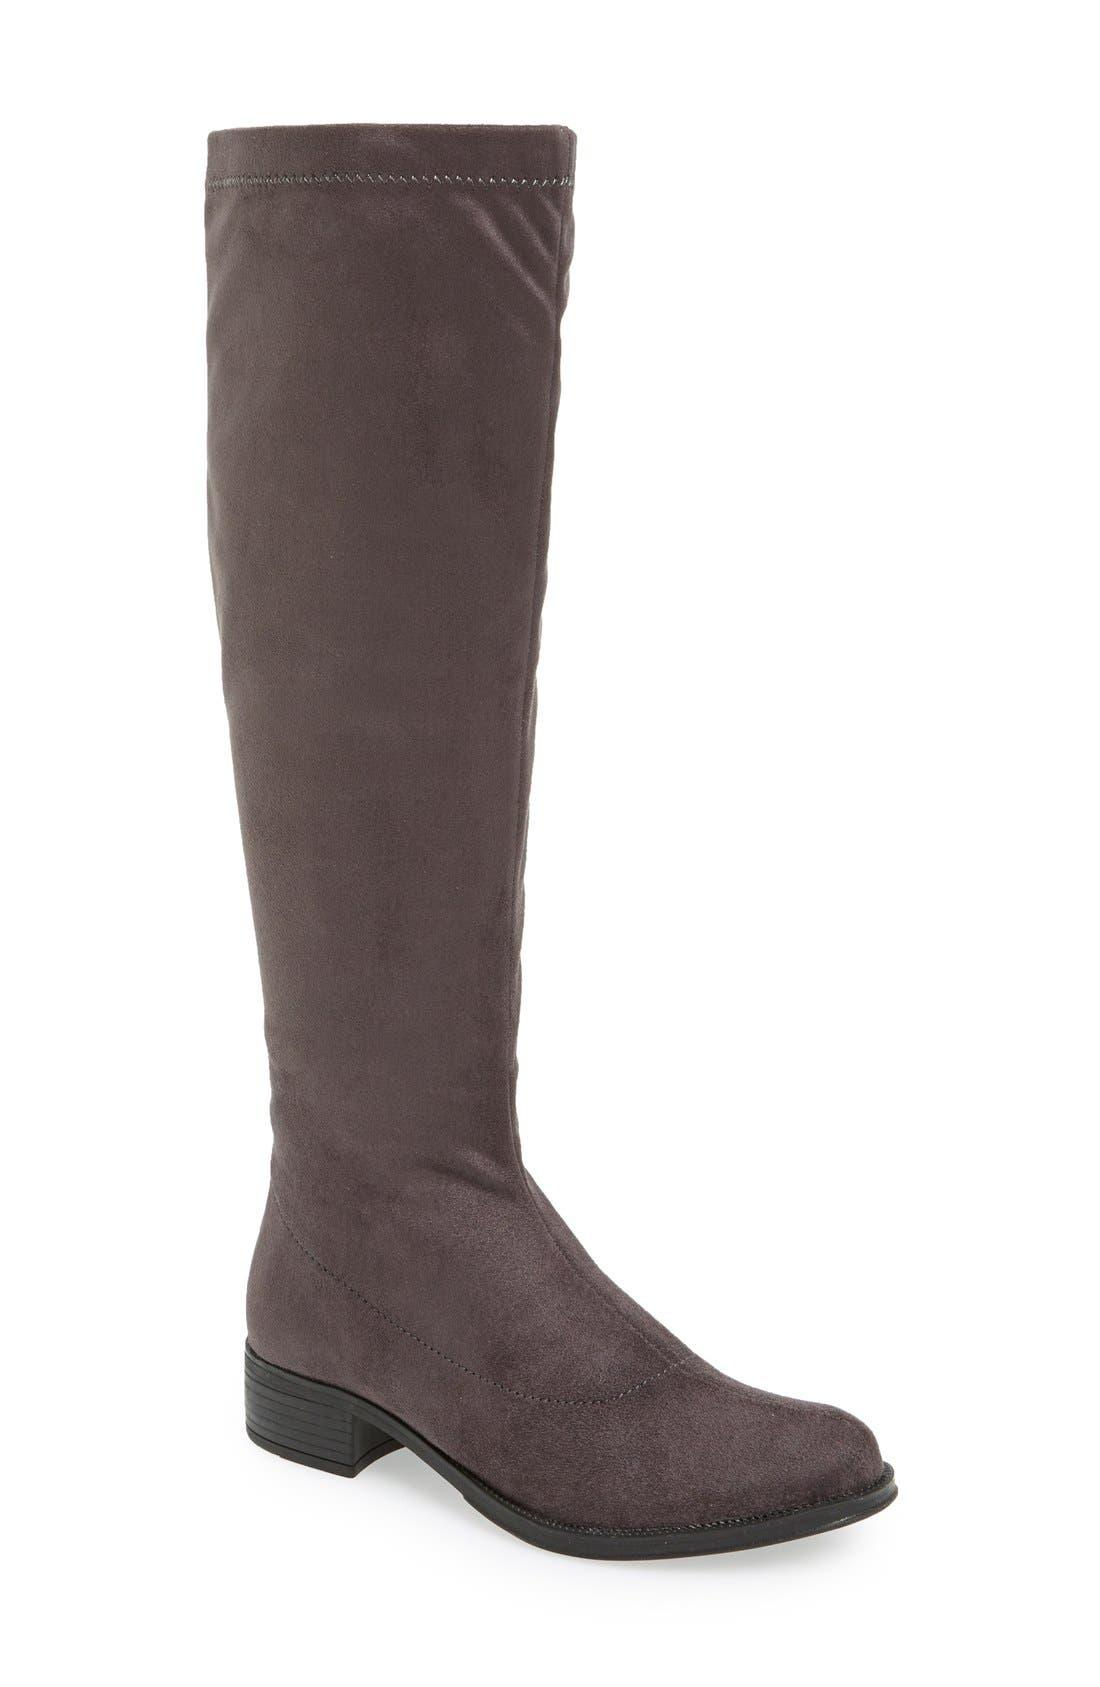 Main Image - Bussola 'Sofia' Tall Boot (Women)